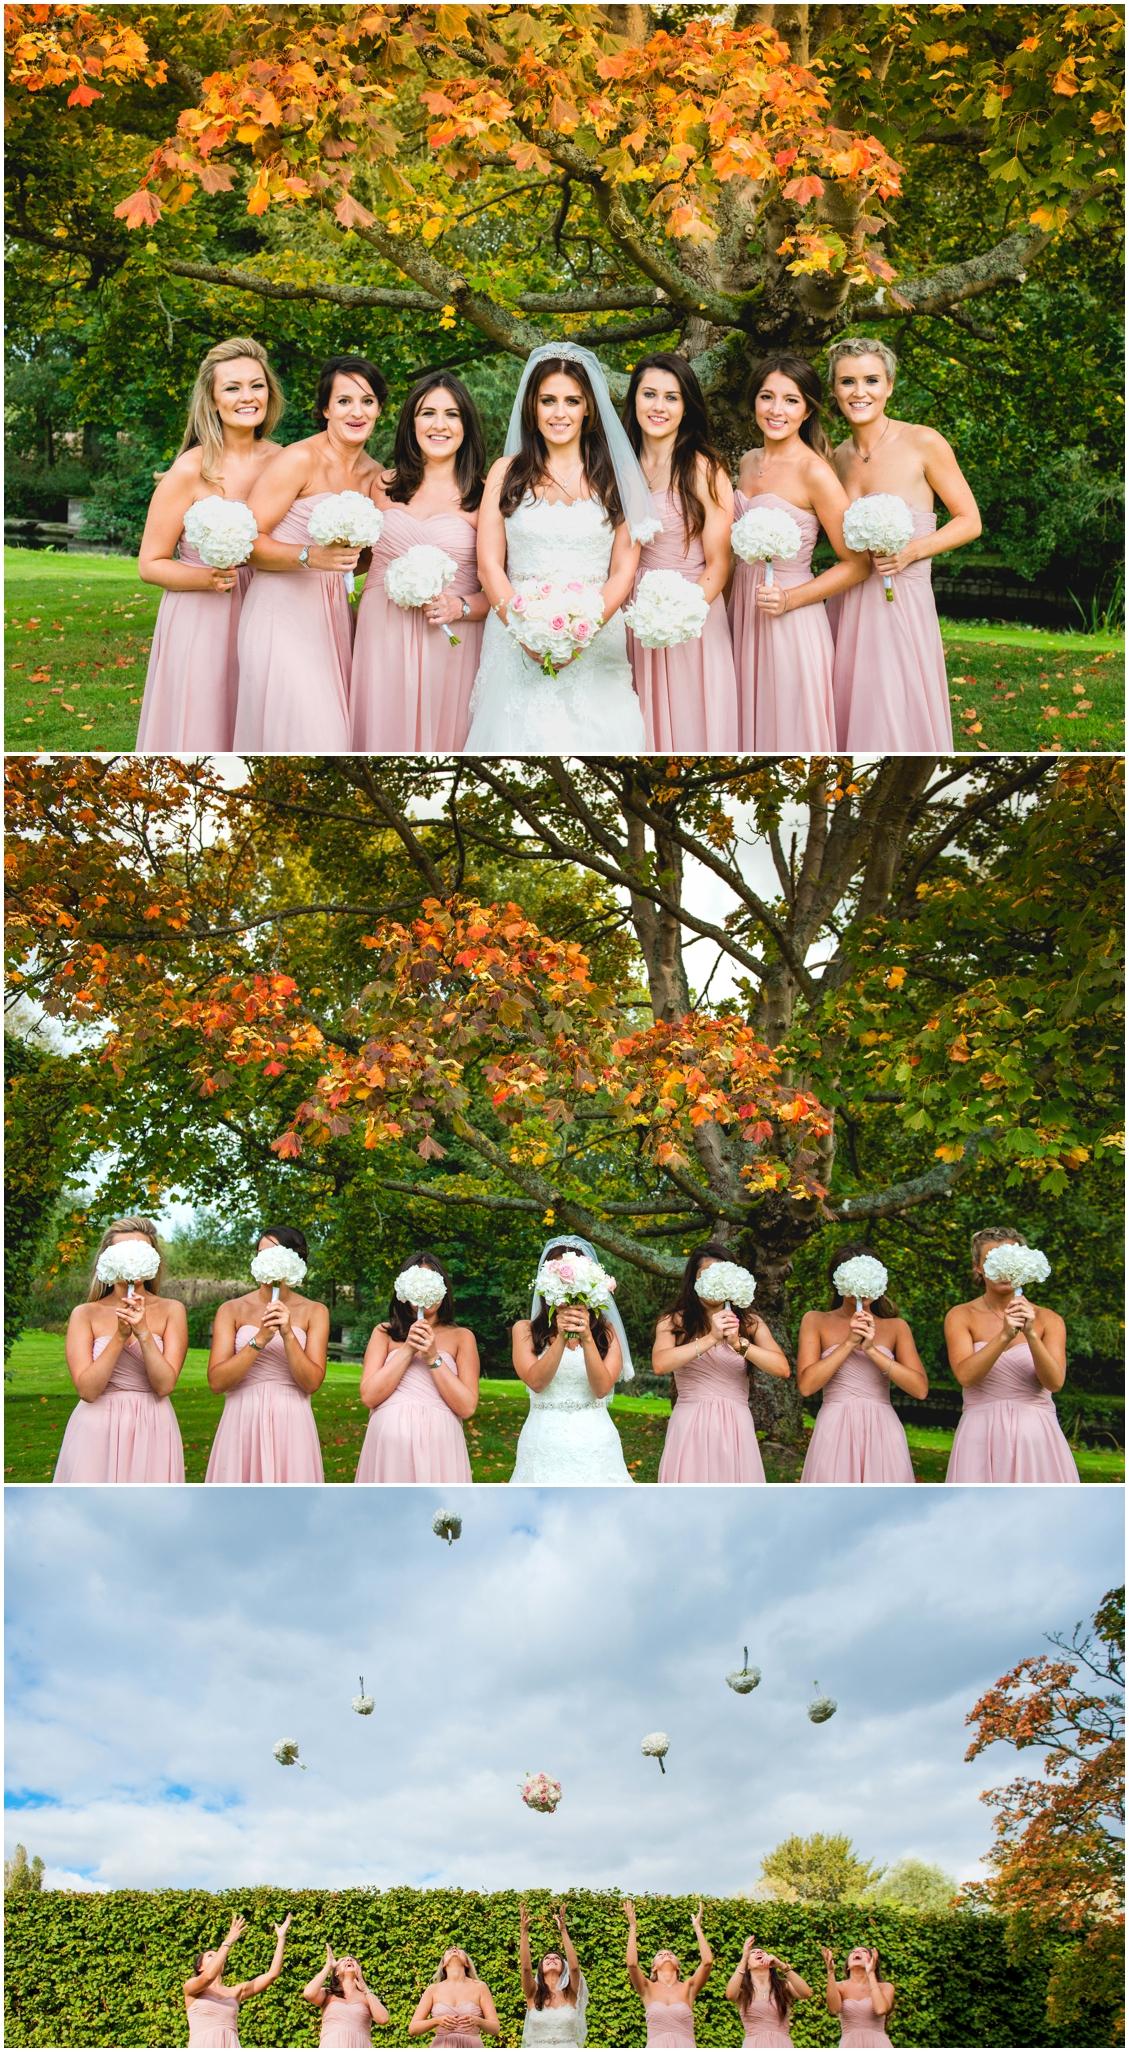 Notley Abbey, bridesmaids, Wedding Photography, Lisa Carpenter Photography, photos, Oxfordshire, West Midlands